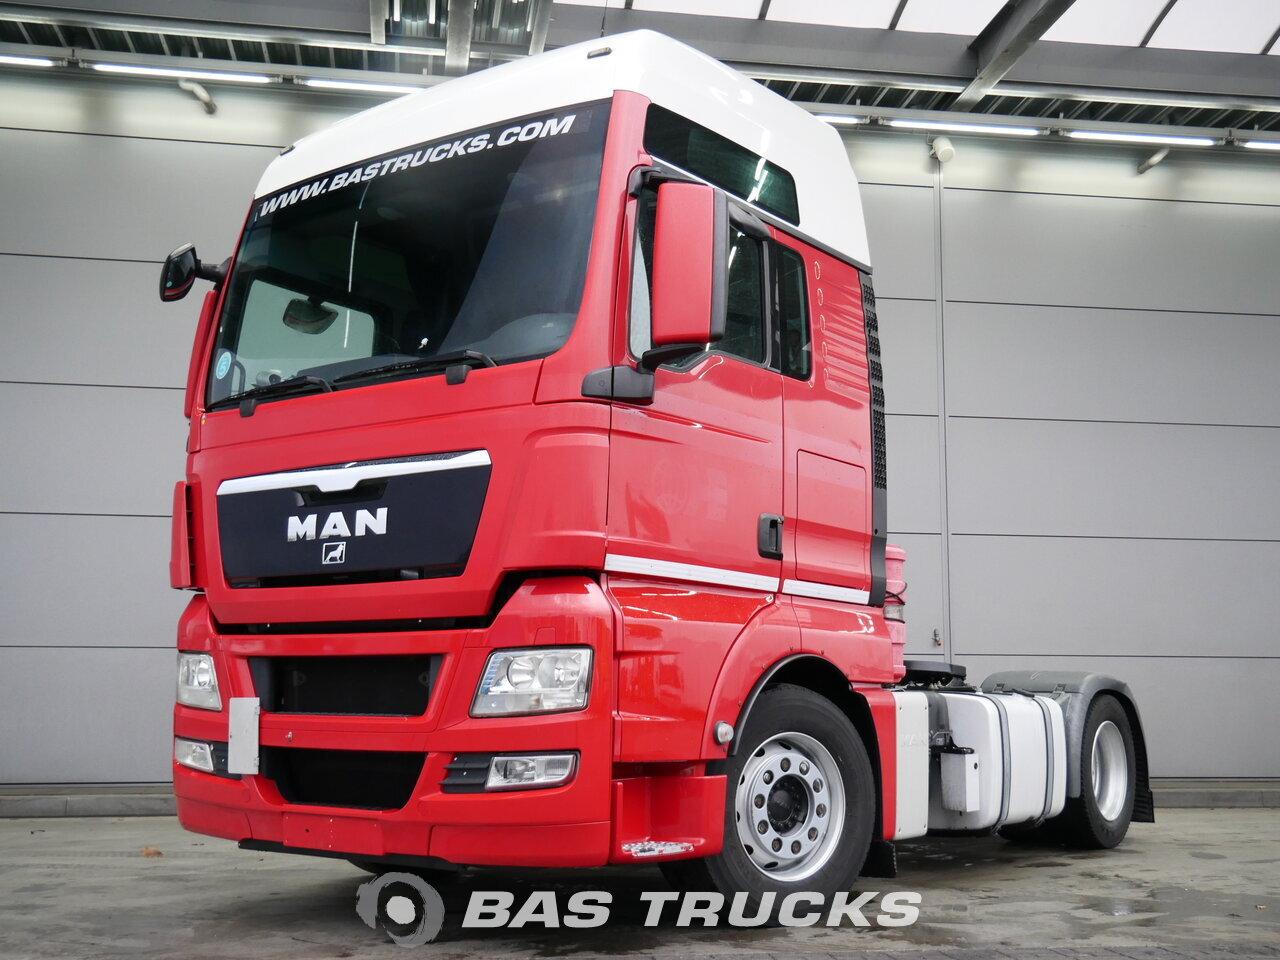 man tgx xxl trattore euro 5 20800 bas trucks. Black Bedroom Furniture Sets. Home Design Ideas